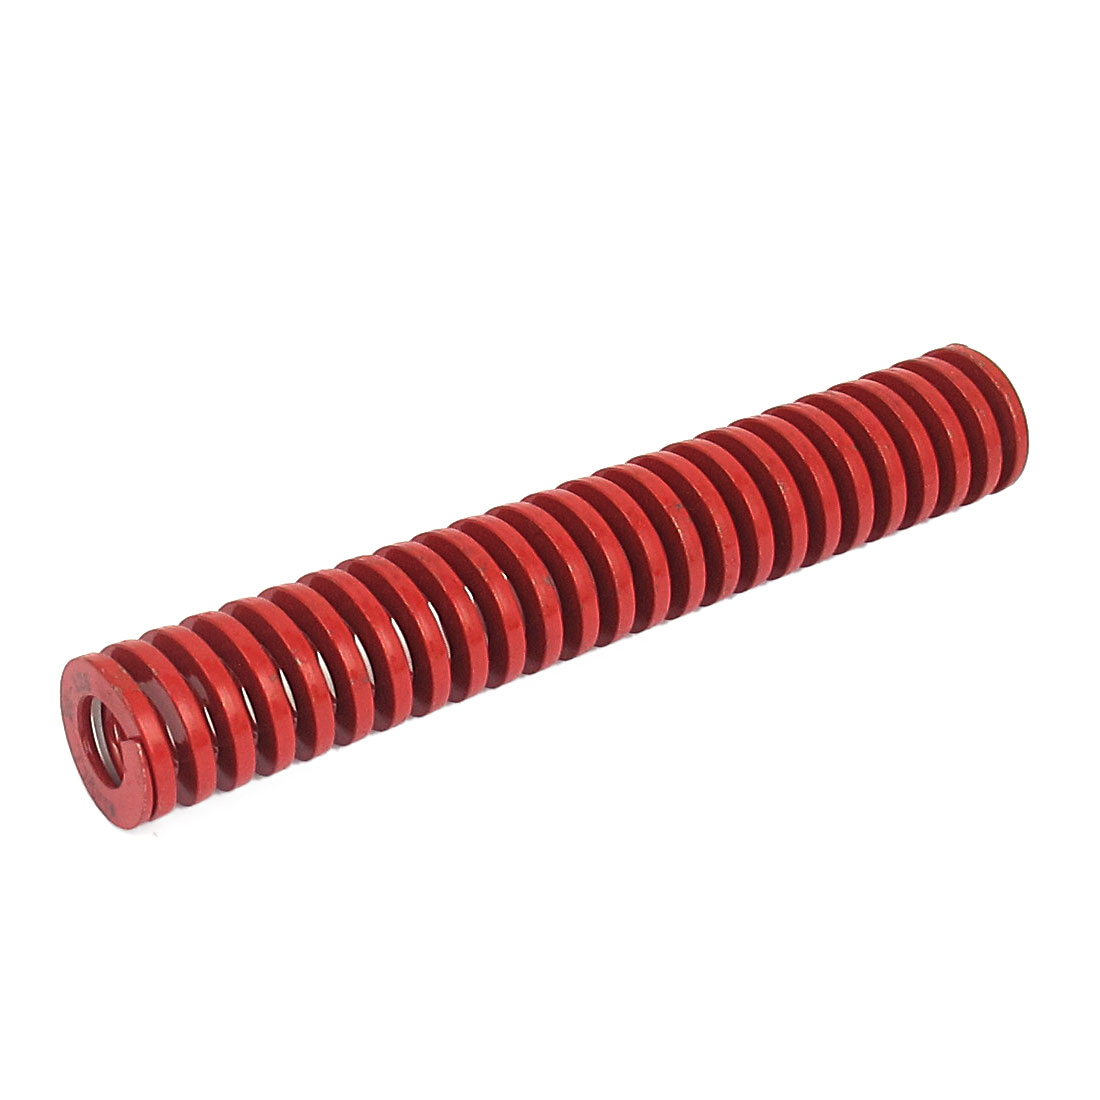 20mm OD 125mm Long Medium Load Spiral Stamping Compression Die Spring Red